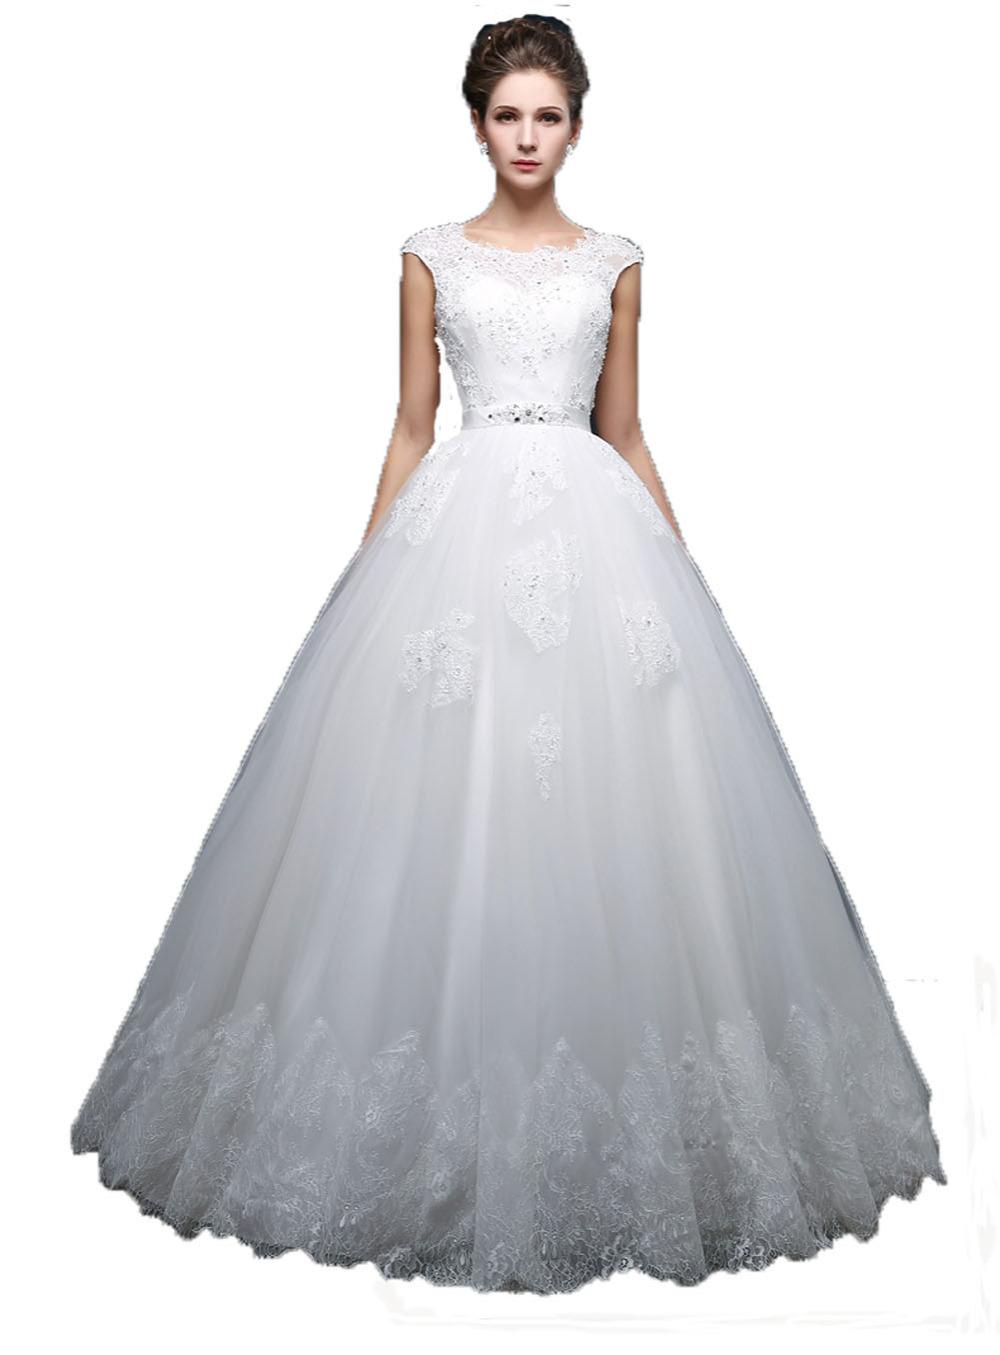 Buy Hot Sale Ball Gown Wedding Dress Plus Size Vestidos De Noiva ...